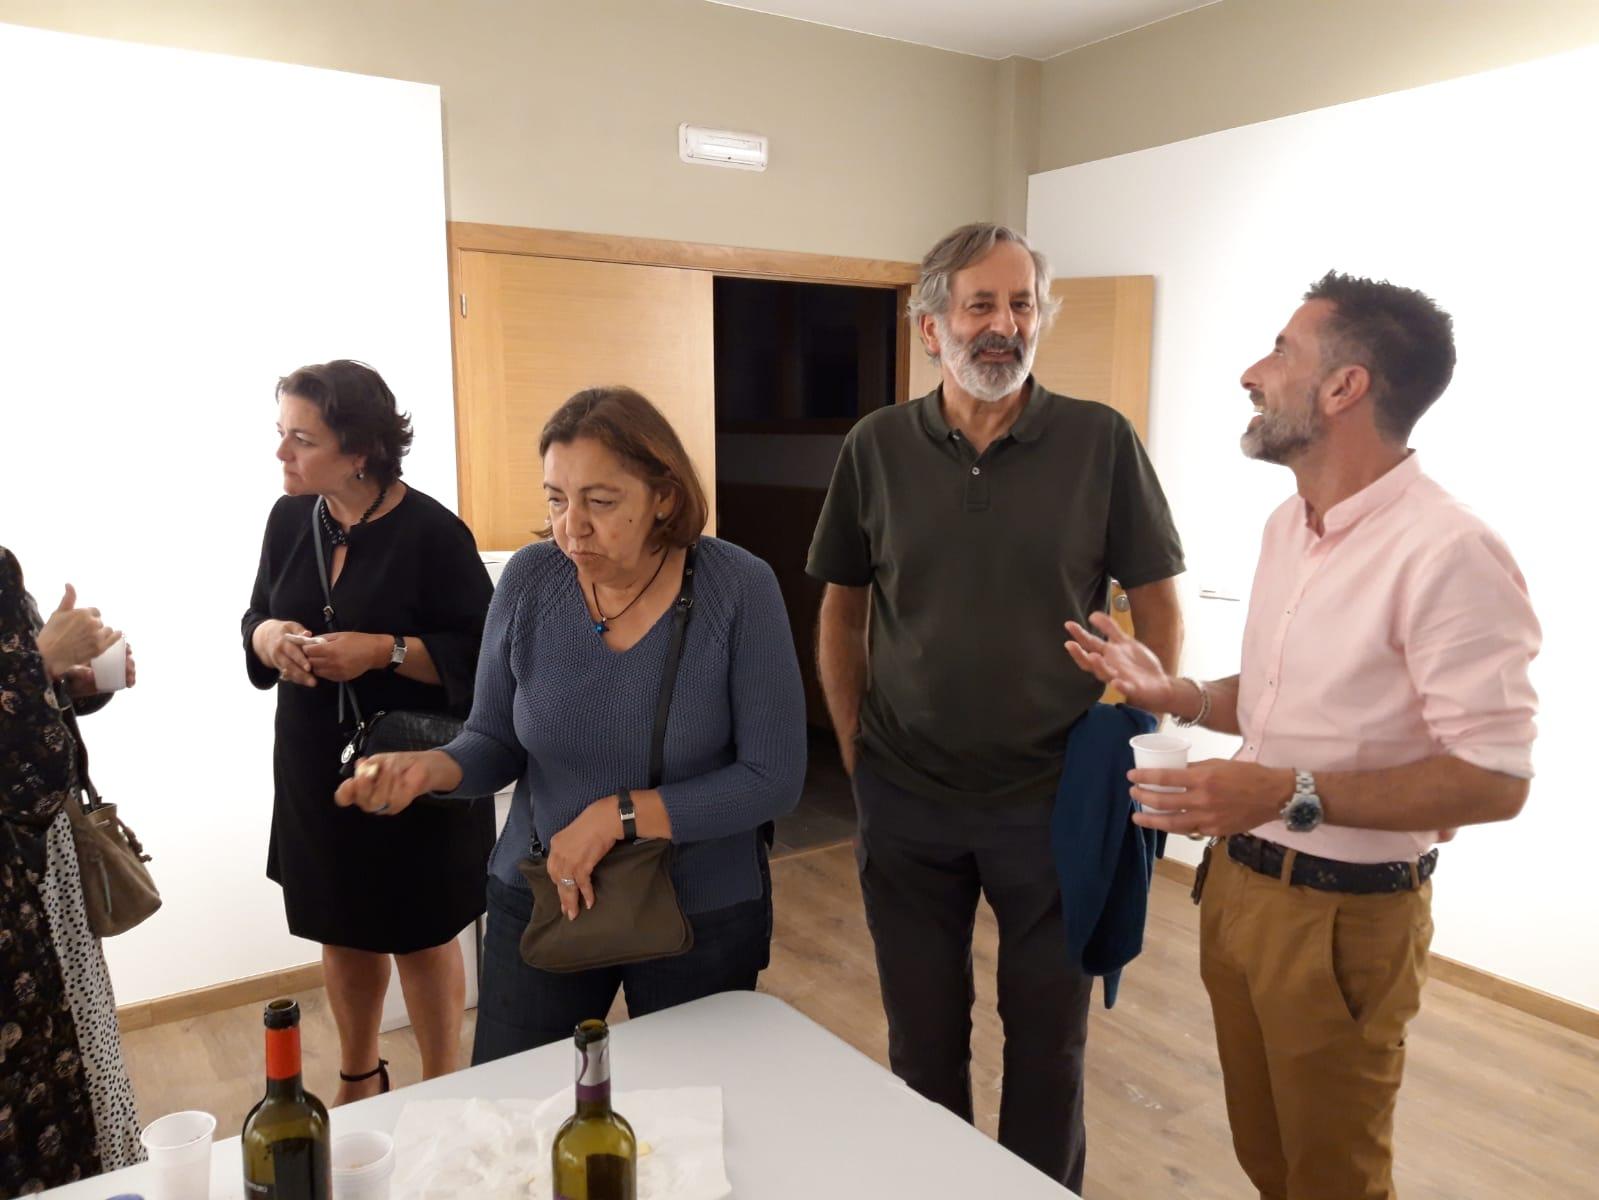 Presentación biografía Carballo Calero, Xulio Pardo de Neyra, Instituto de Estudos Ulloáns